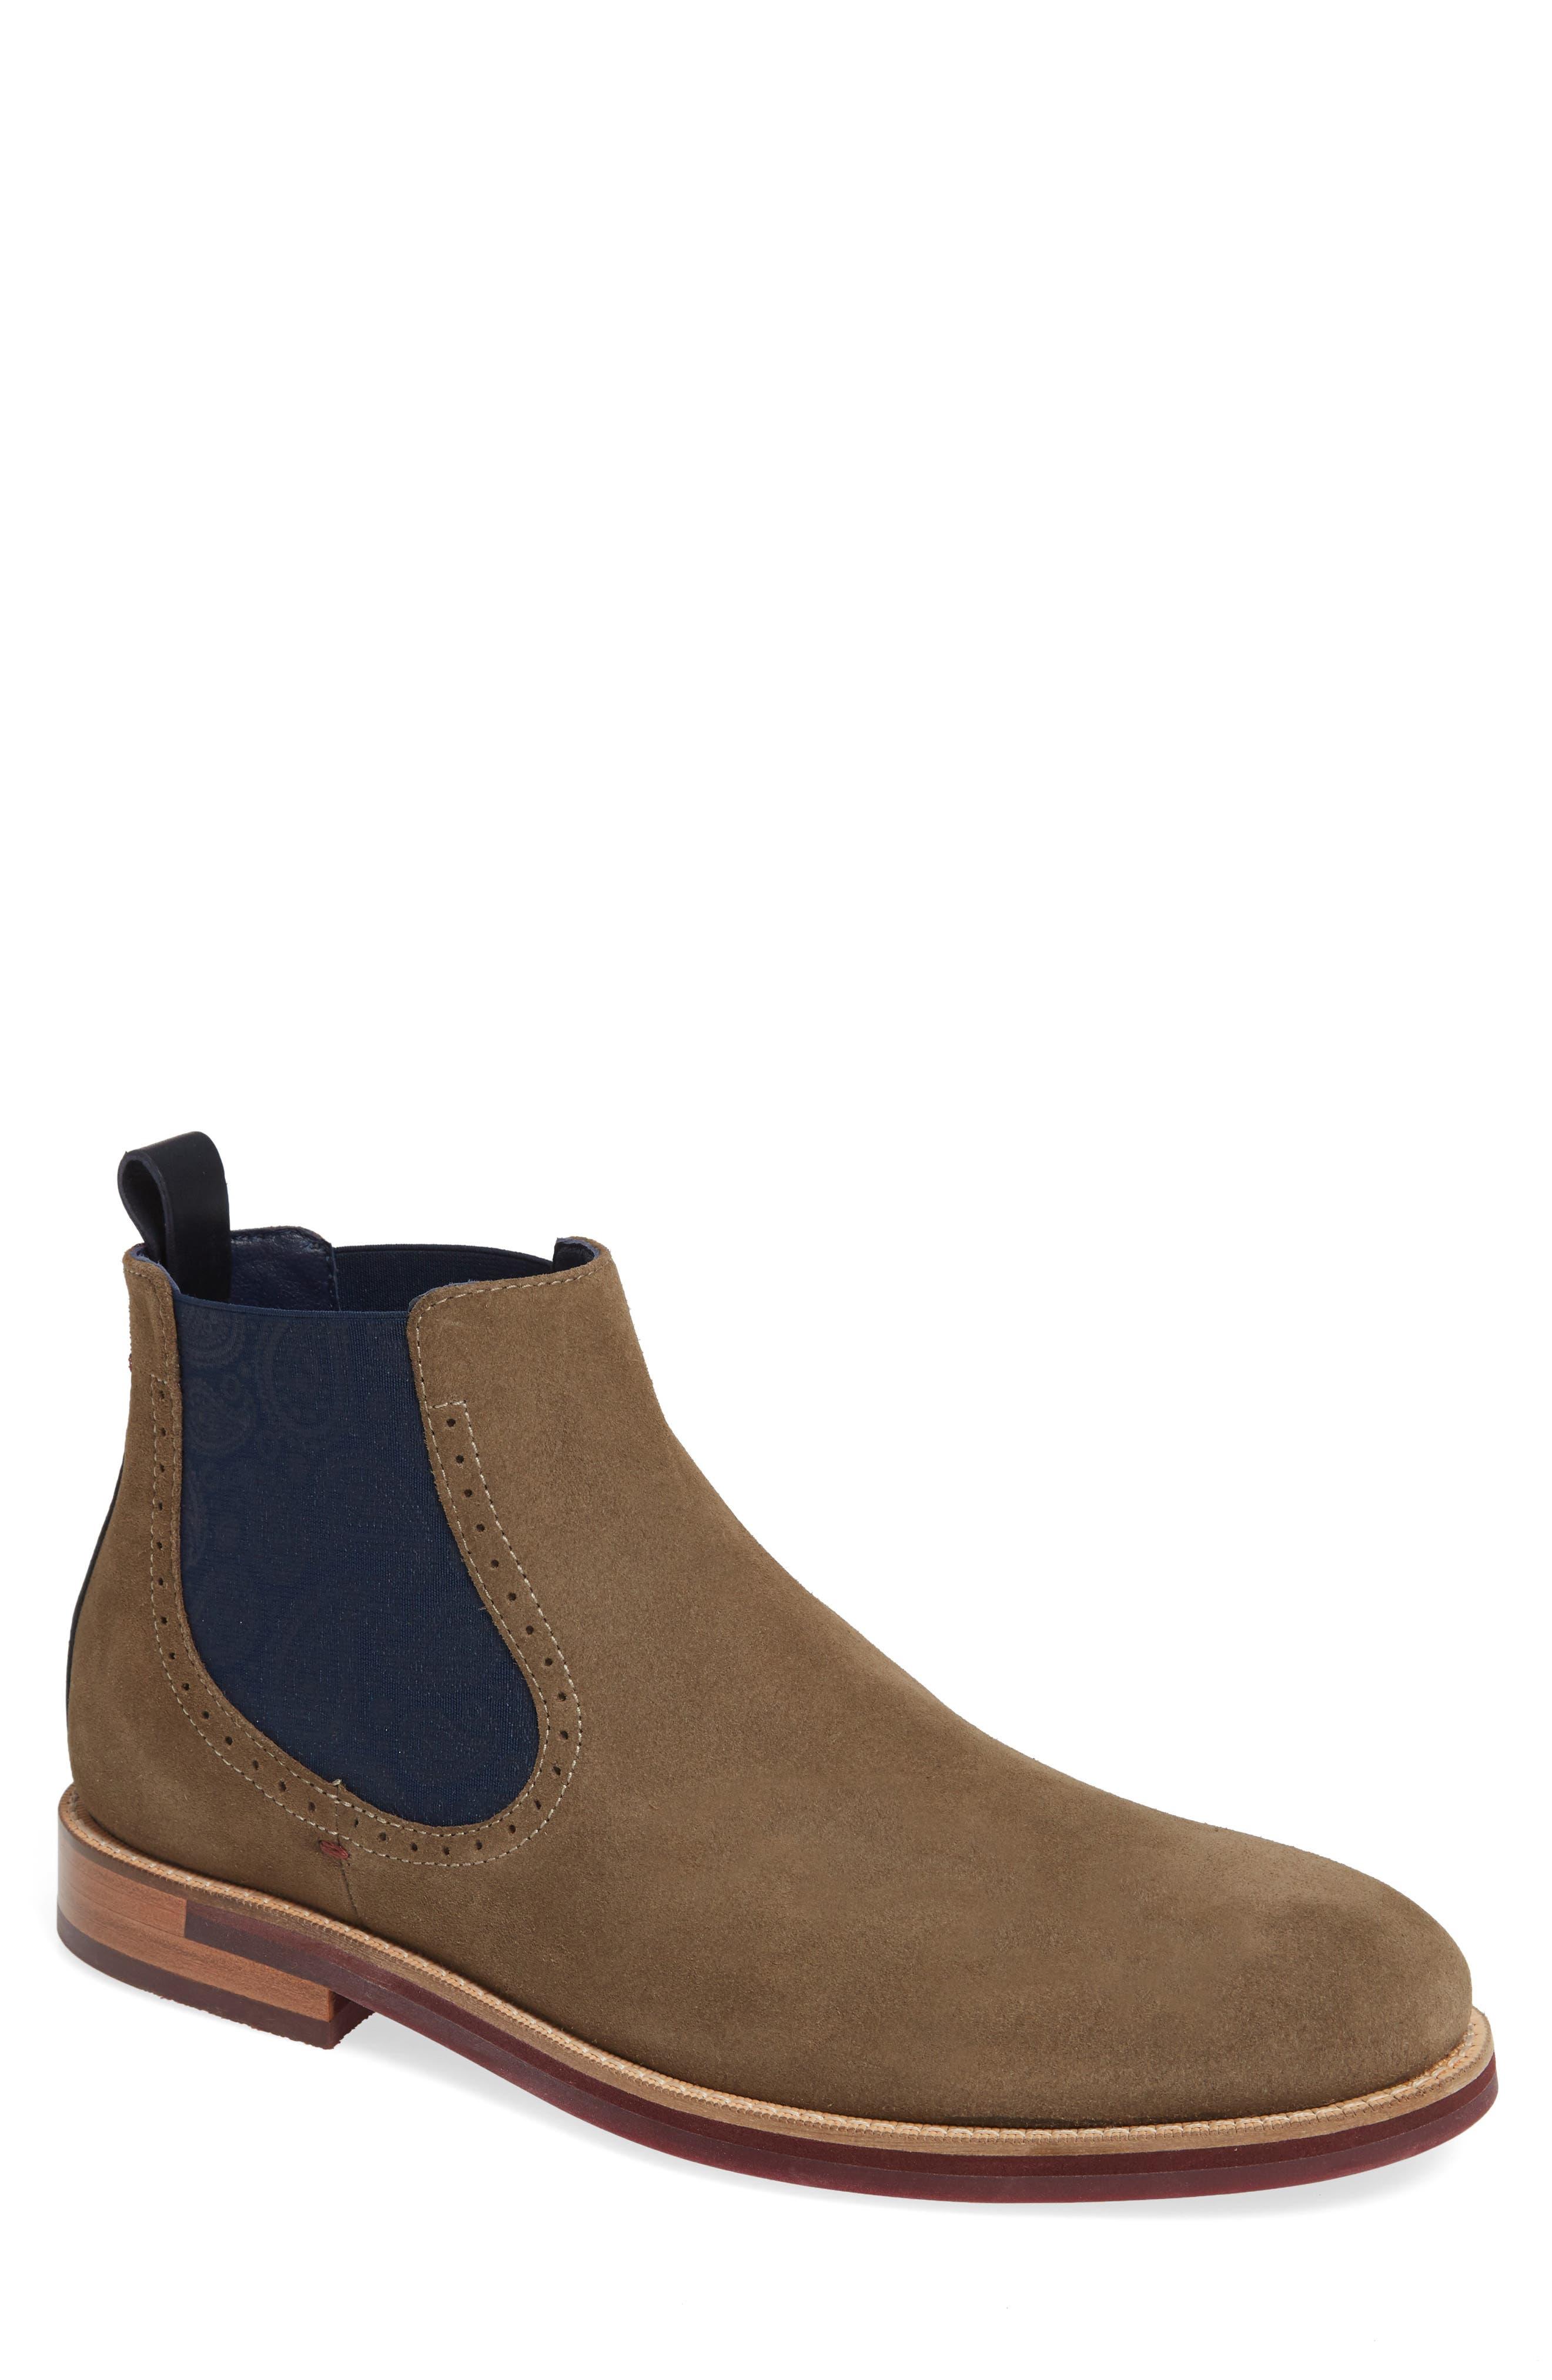 Ted Baker London Secaint Chelsea Boot- Grey